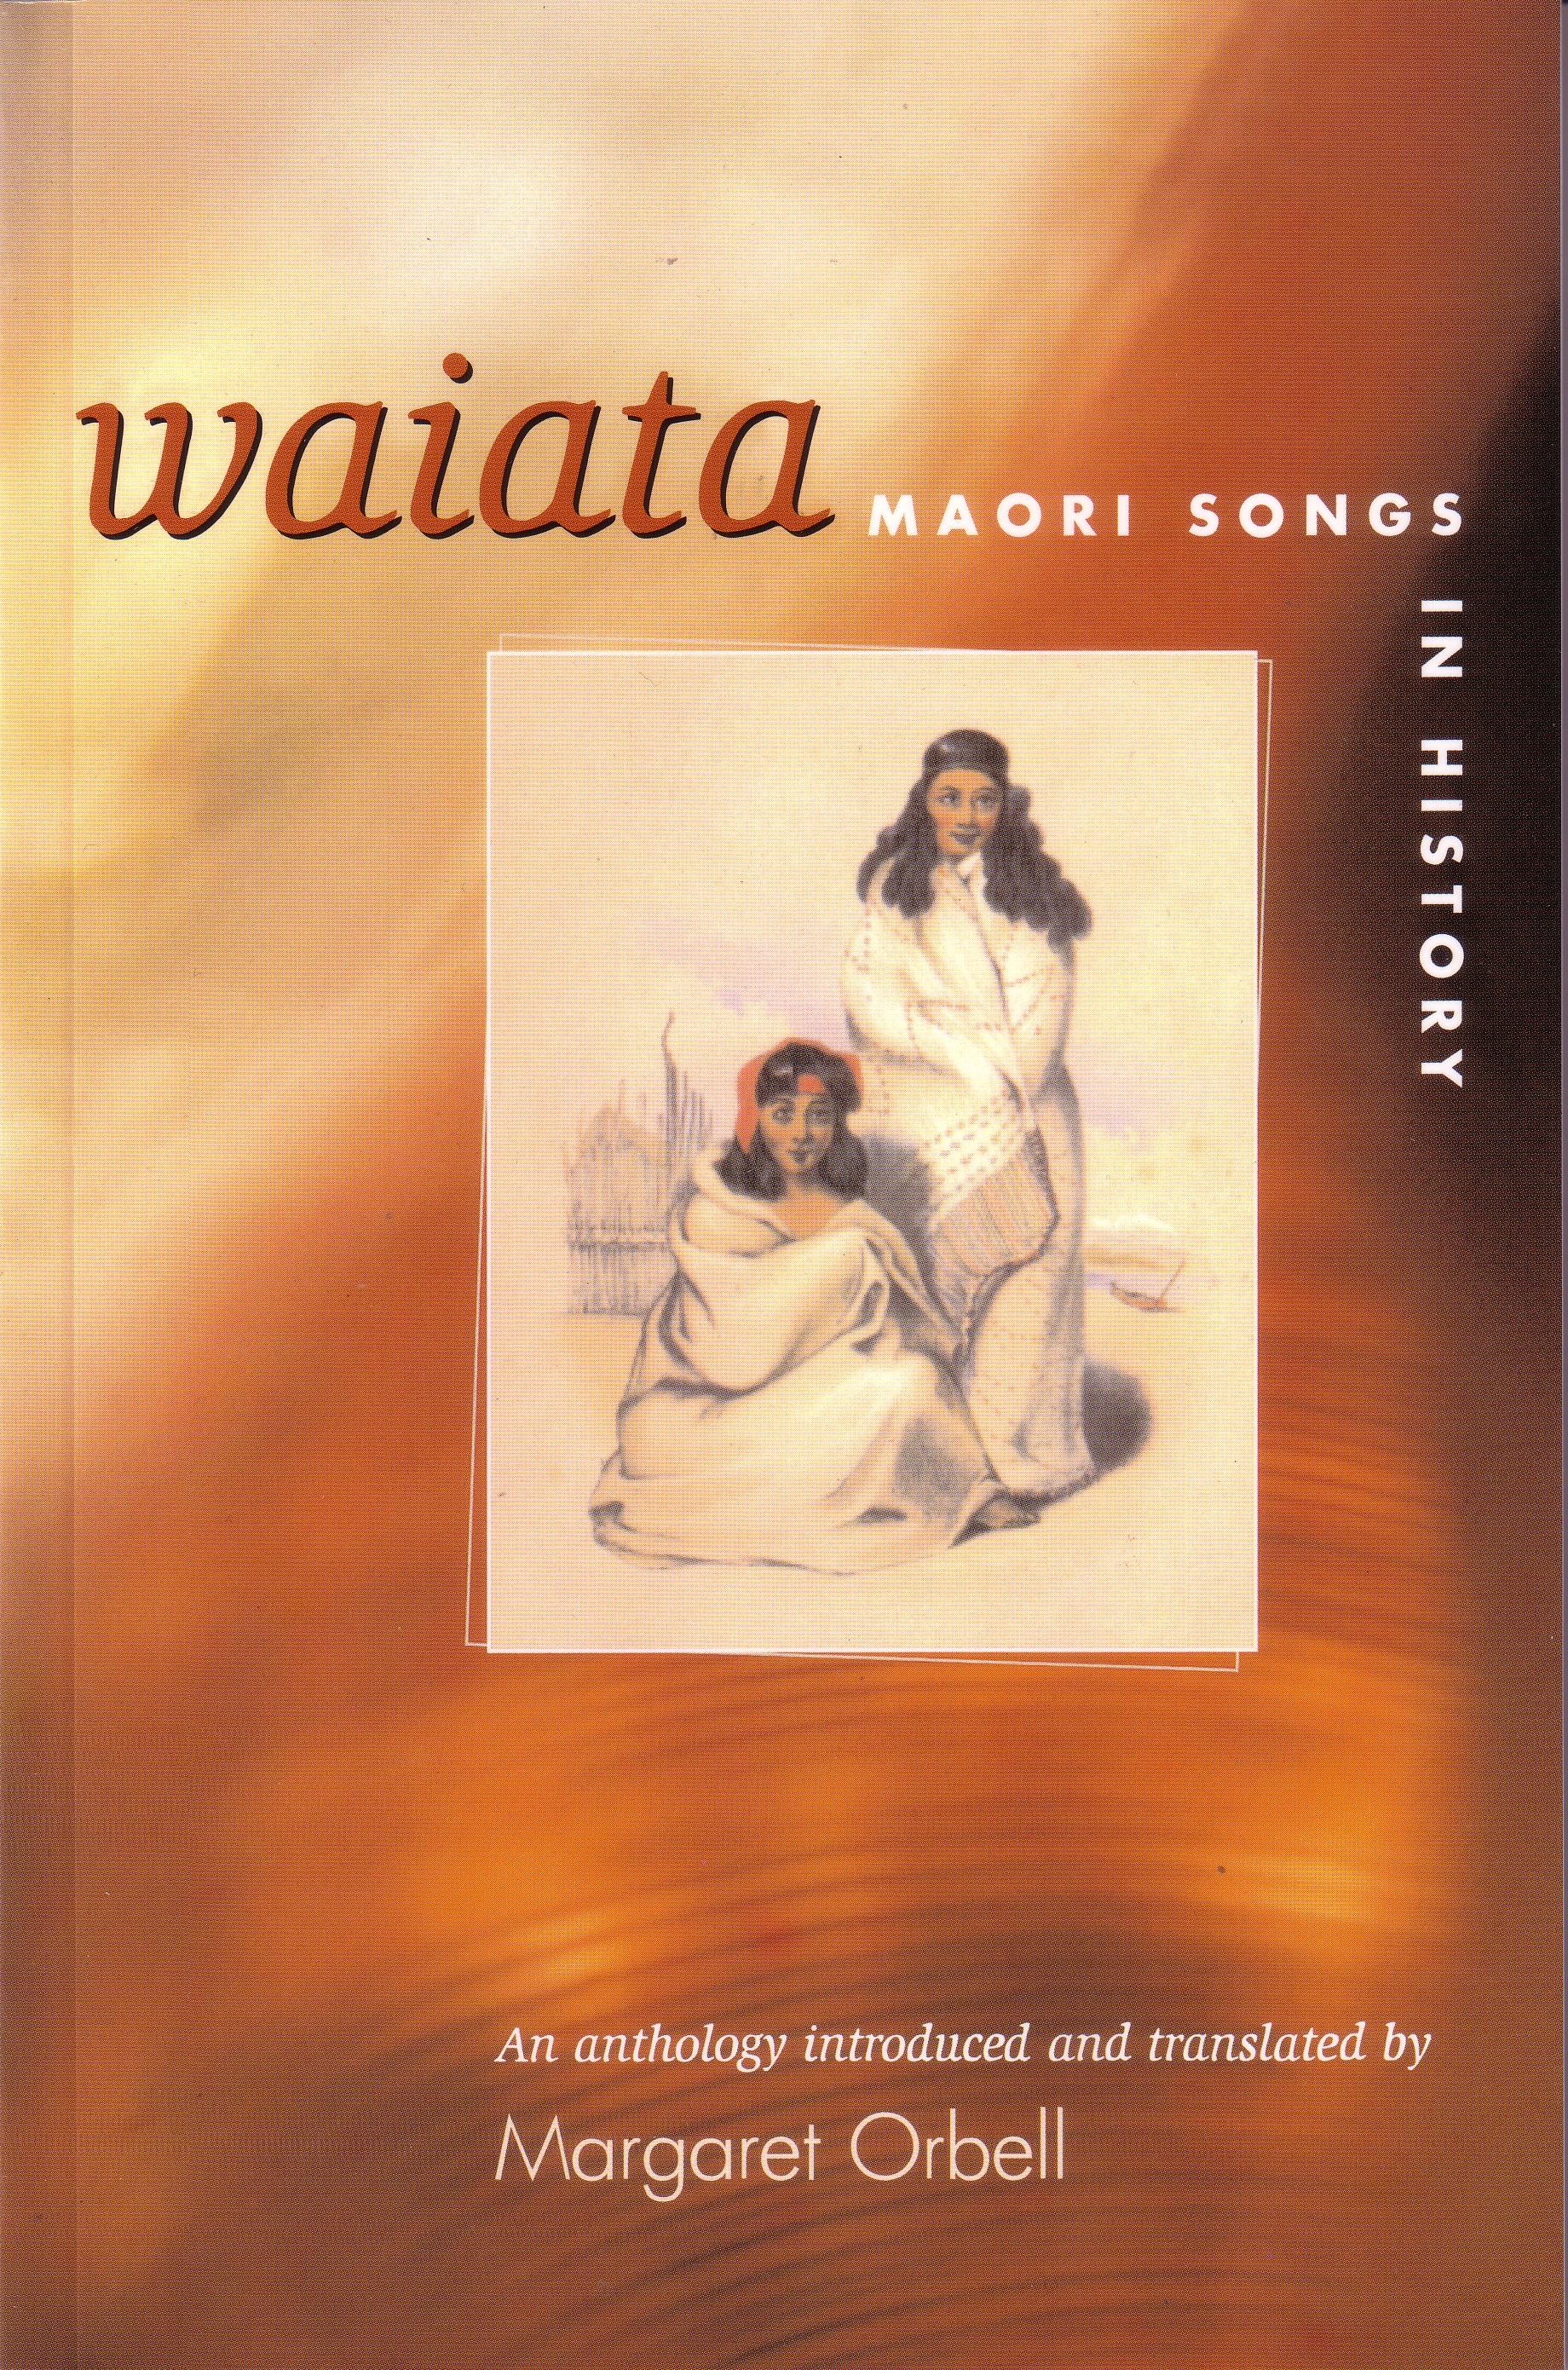 Penguin Book Cover History : Waiata maori songs in history penguin books new zealand